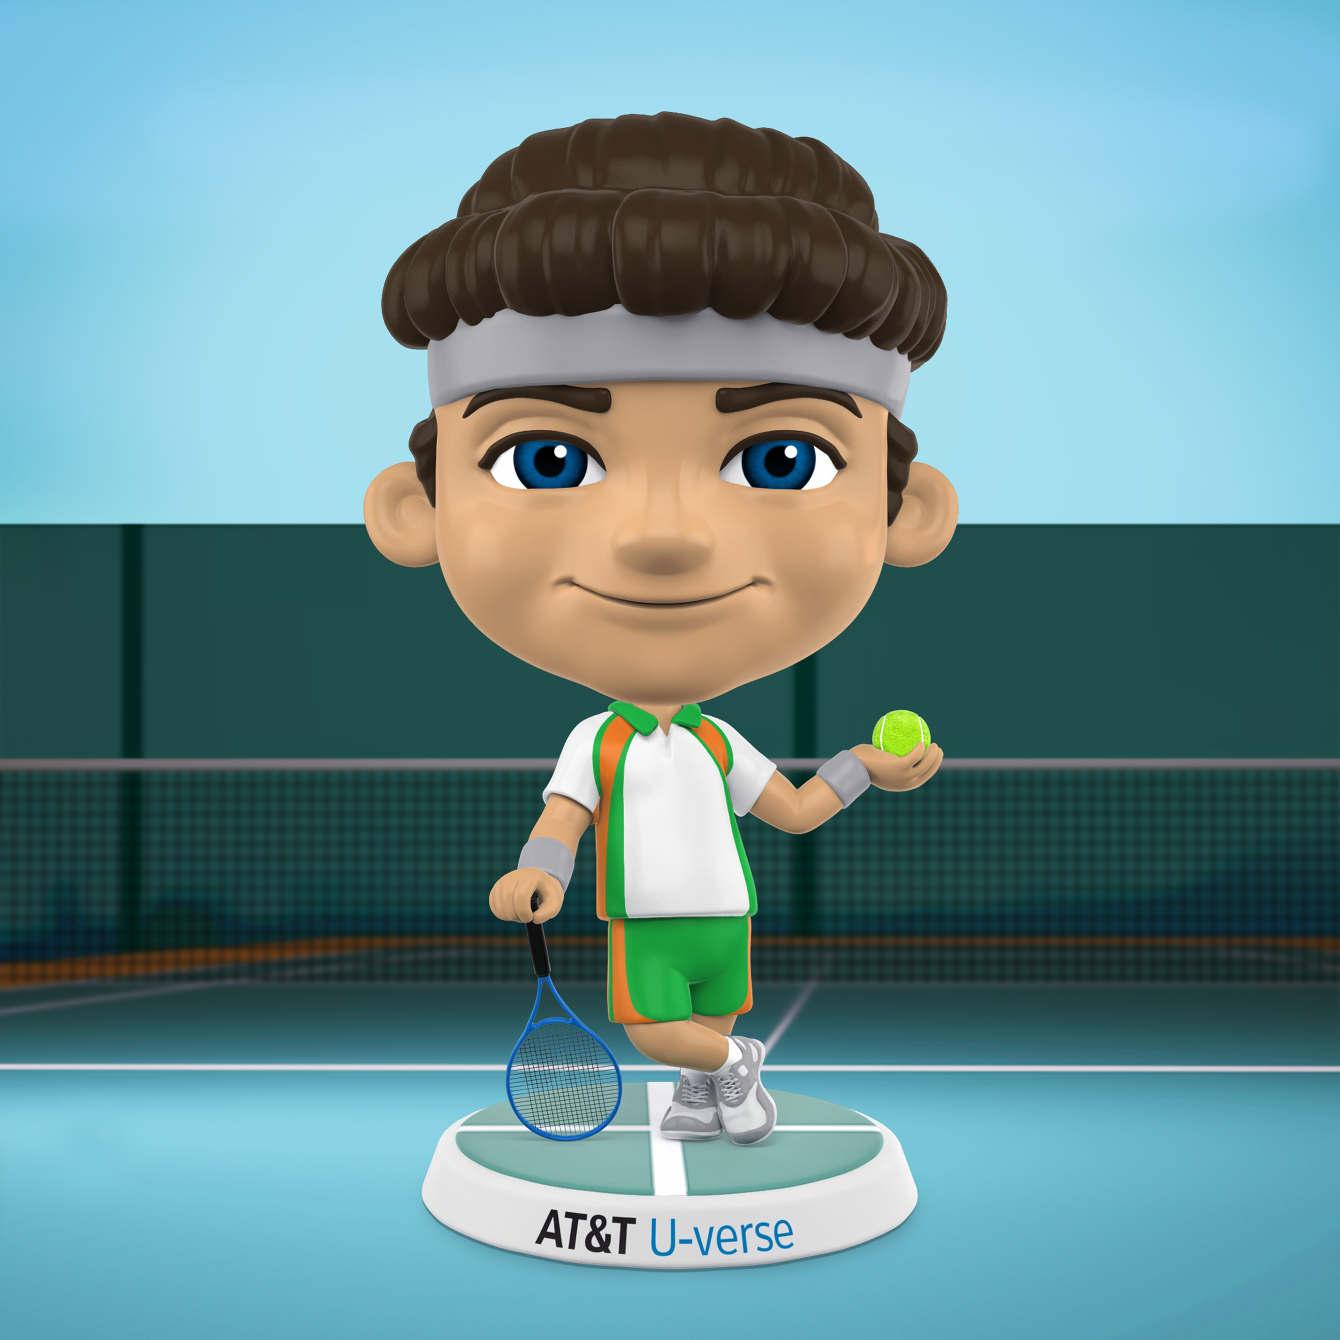 ATT-U-verse-Bobbleheads-Tennis_M_1340_c.jpg